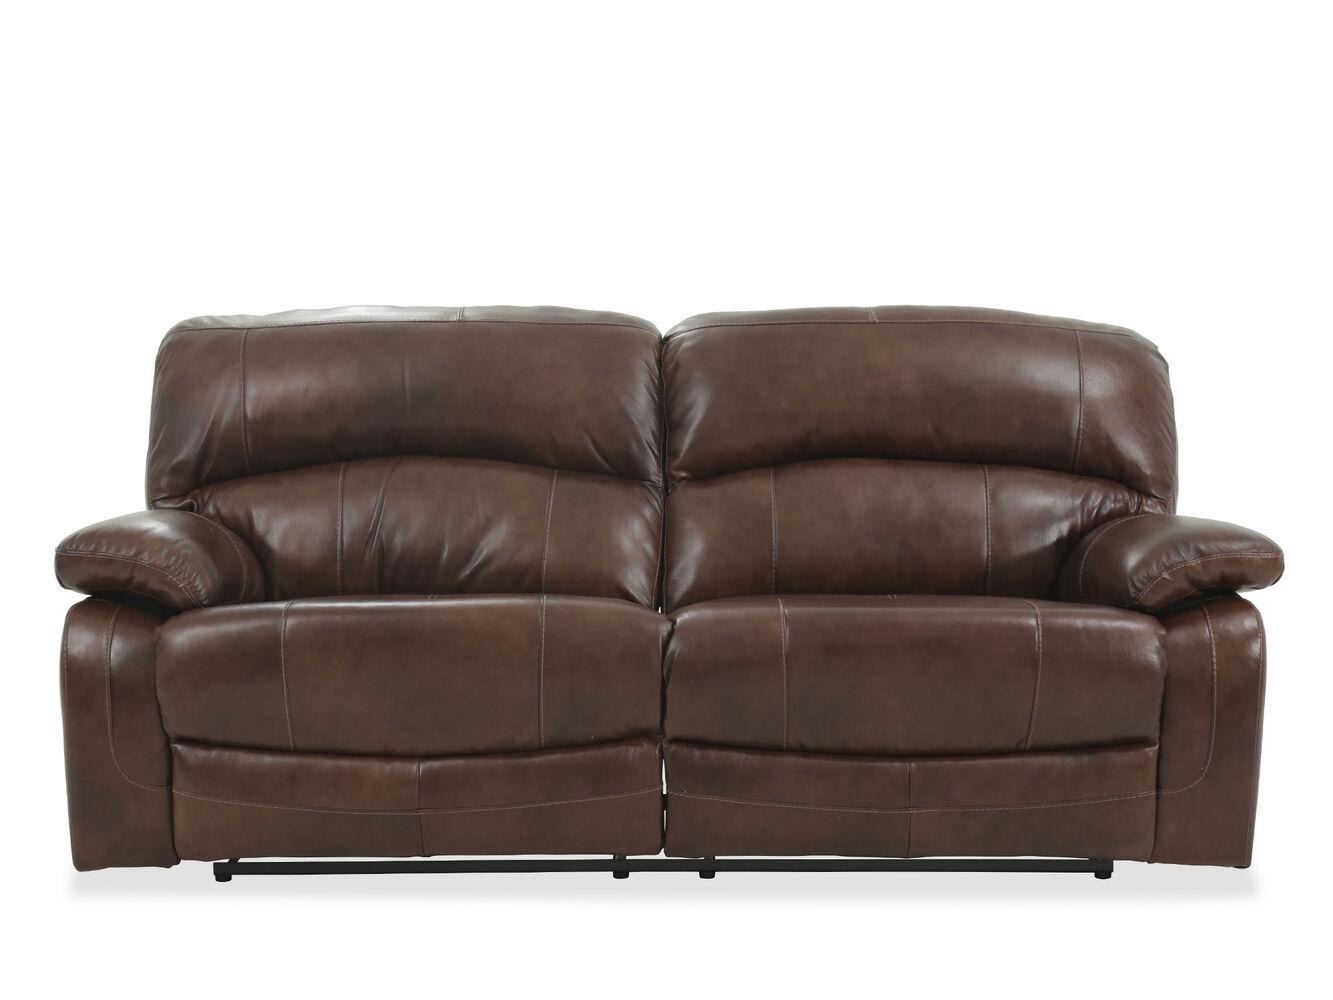 sofa savertm sofa savers as seen on tv ergonomic saver boards photos thesofa. Black Bedroom Furniture Sets. Home Design Ideas